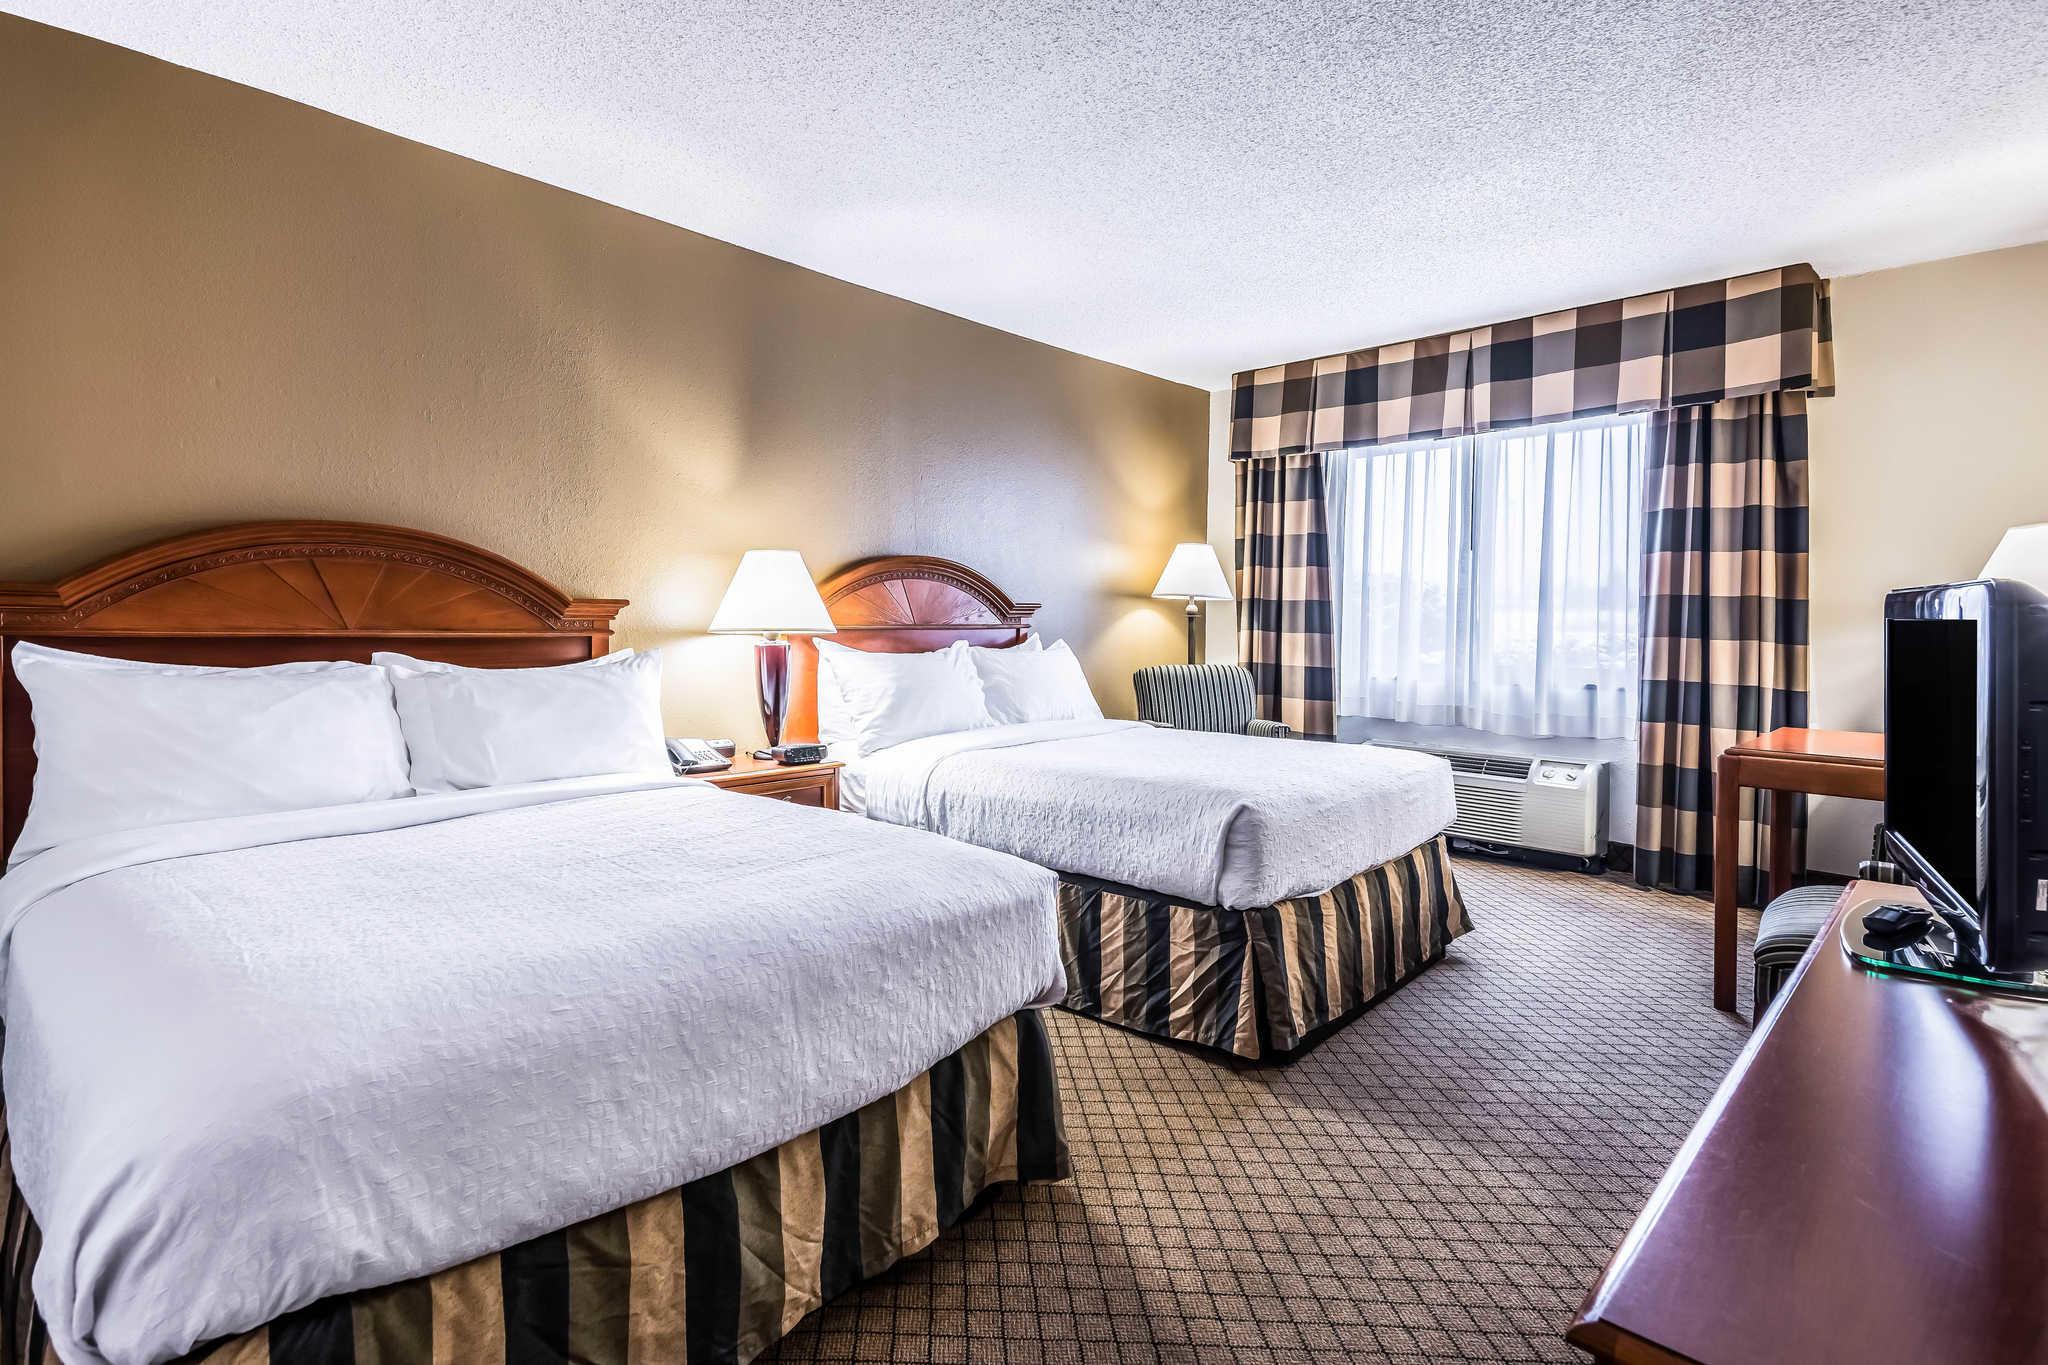 Quality Inn near Finger Lakes and Seneca Falls image 7